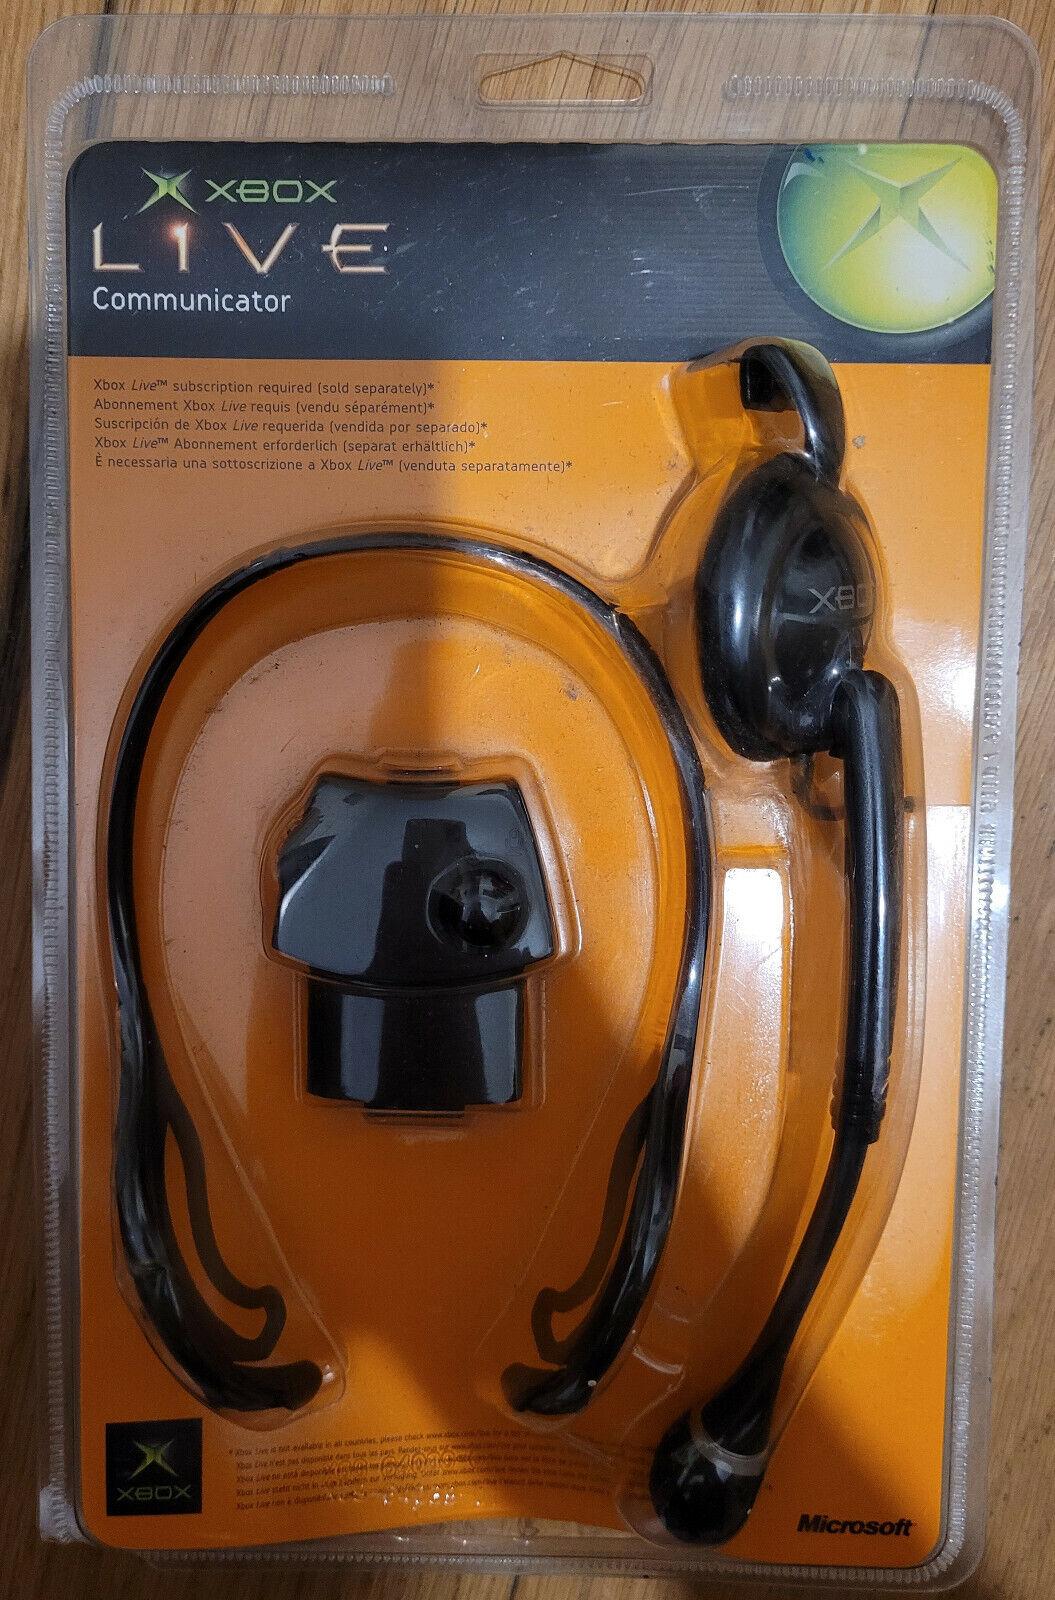 XBOX Live Communicator for Microsoft XBOX from Microsoft